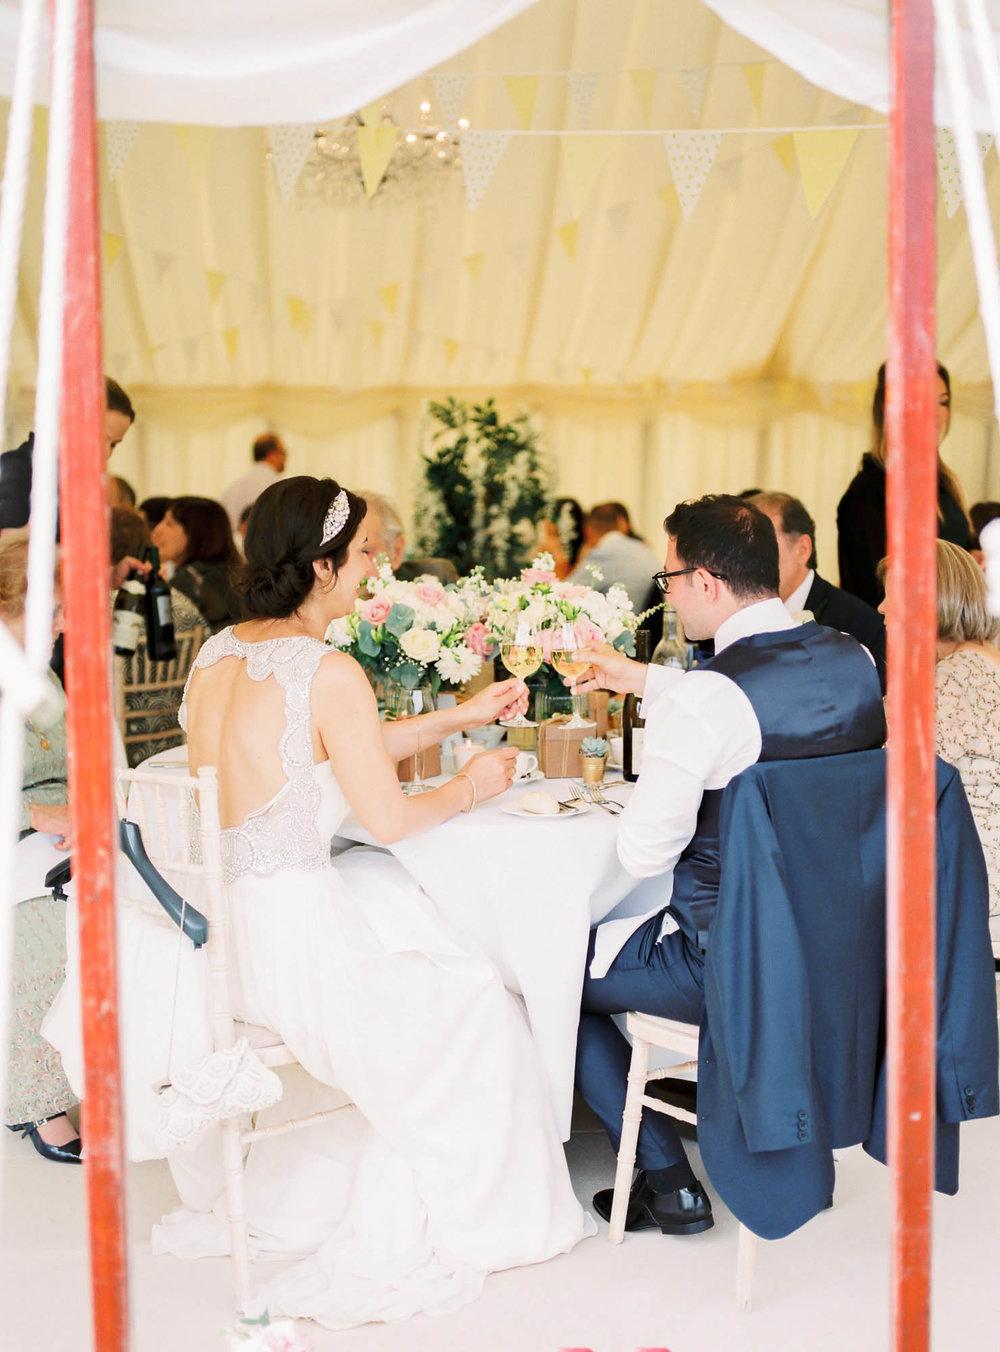 Amy O'Boyle Photography- Destination & UK Fine Art Film Wedding Photographer- Brickendonbury Estate Wedding-36.jpg